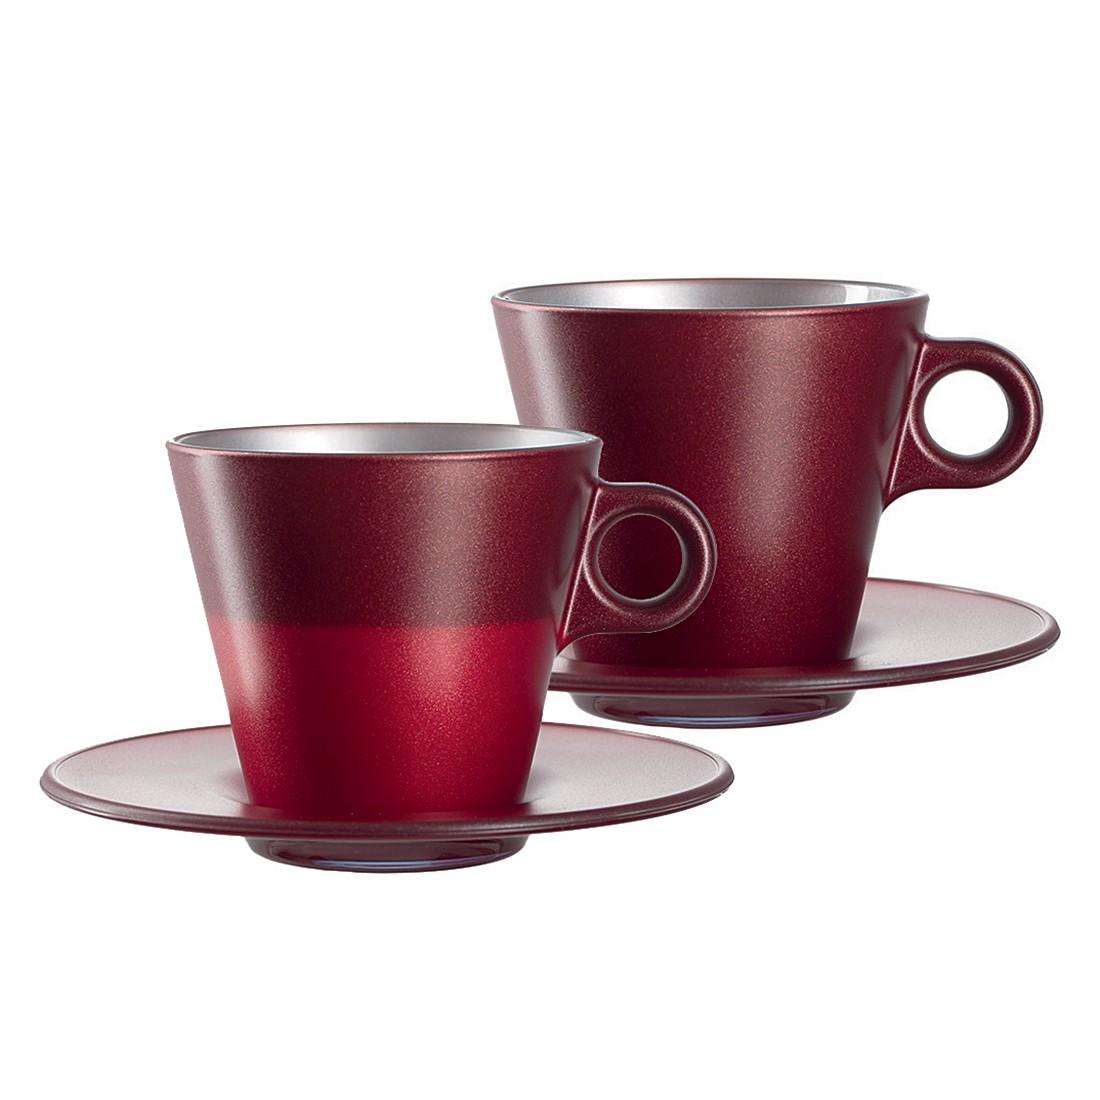 Cappuccinotasse Ooh Magico (2er-Set) – Rot Metallic, Leonardo online kaufen